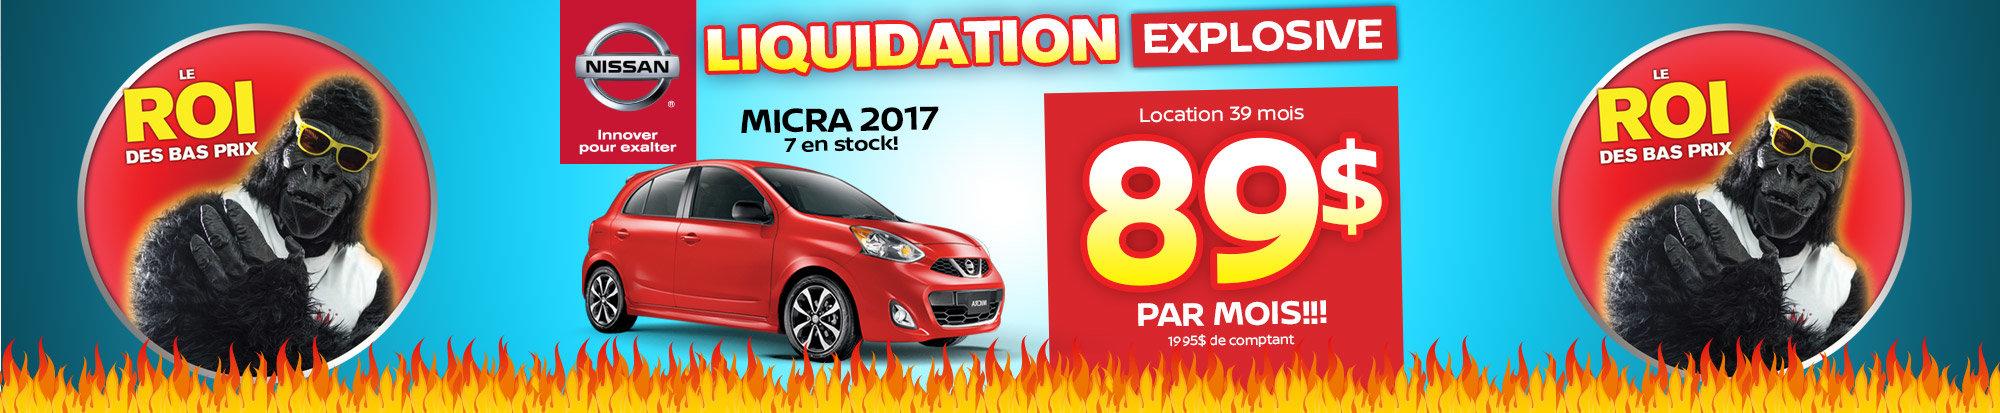 Méga liquidation Micra 2017 (web)